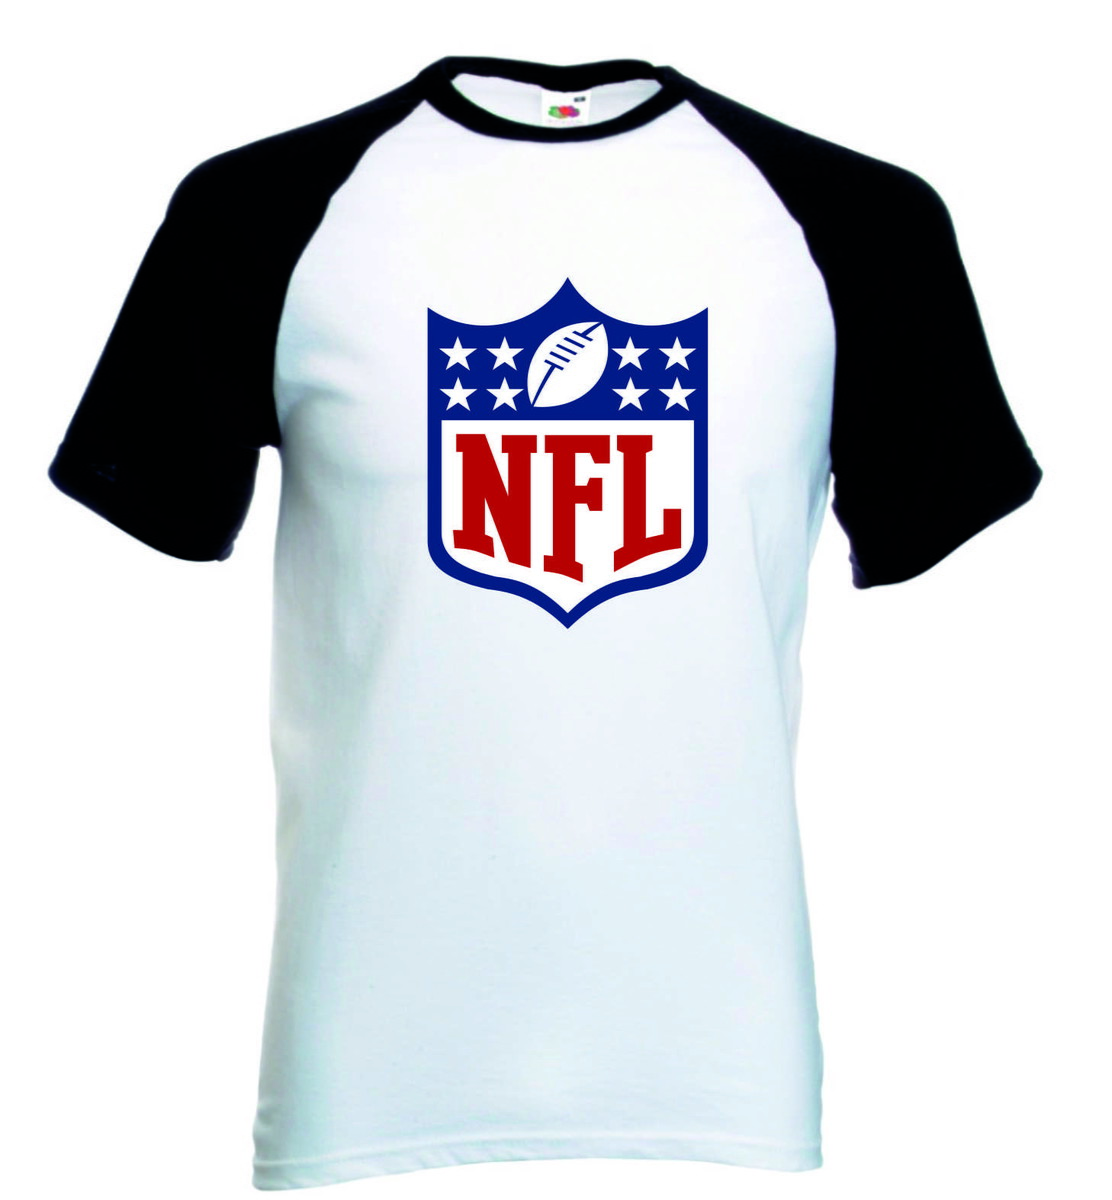 Camiseta Raglan Manga Curta NFL Futebol Americano no Elo7 ... 80e8a1028b6fc